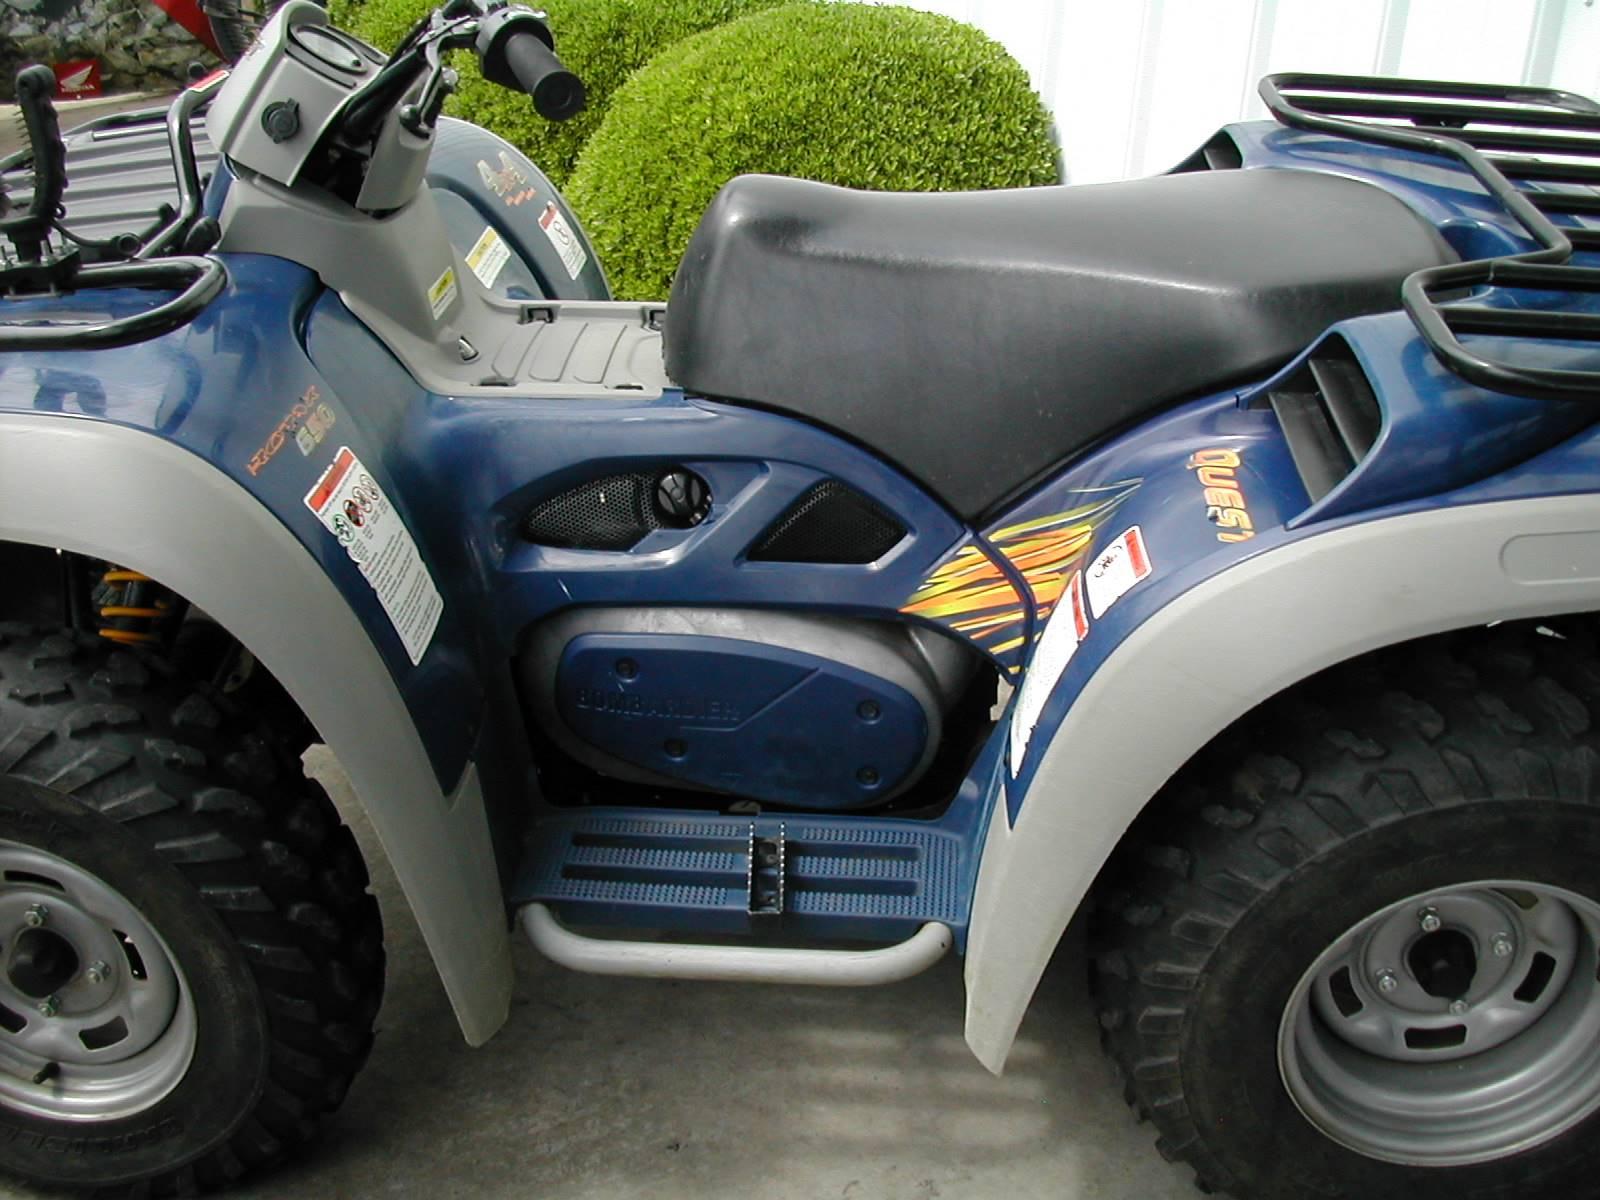 2002 Quest 650